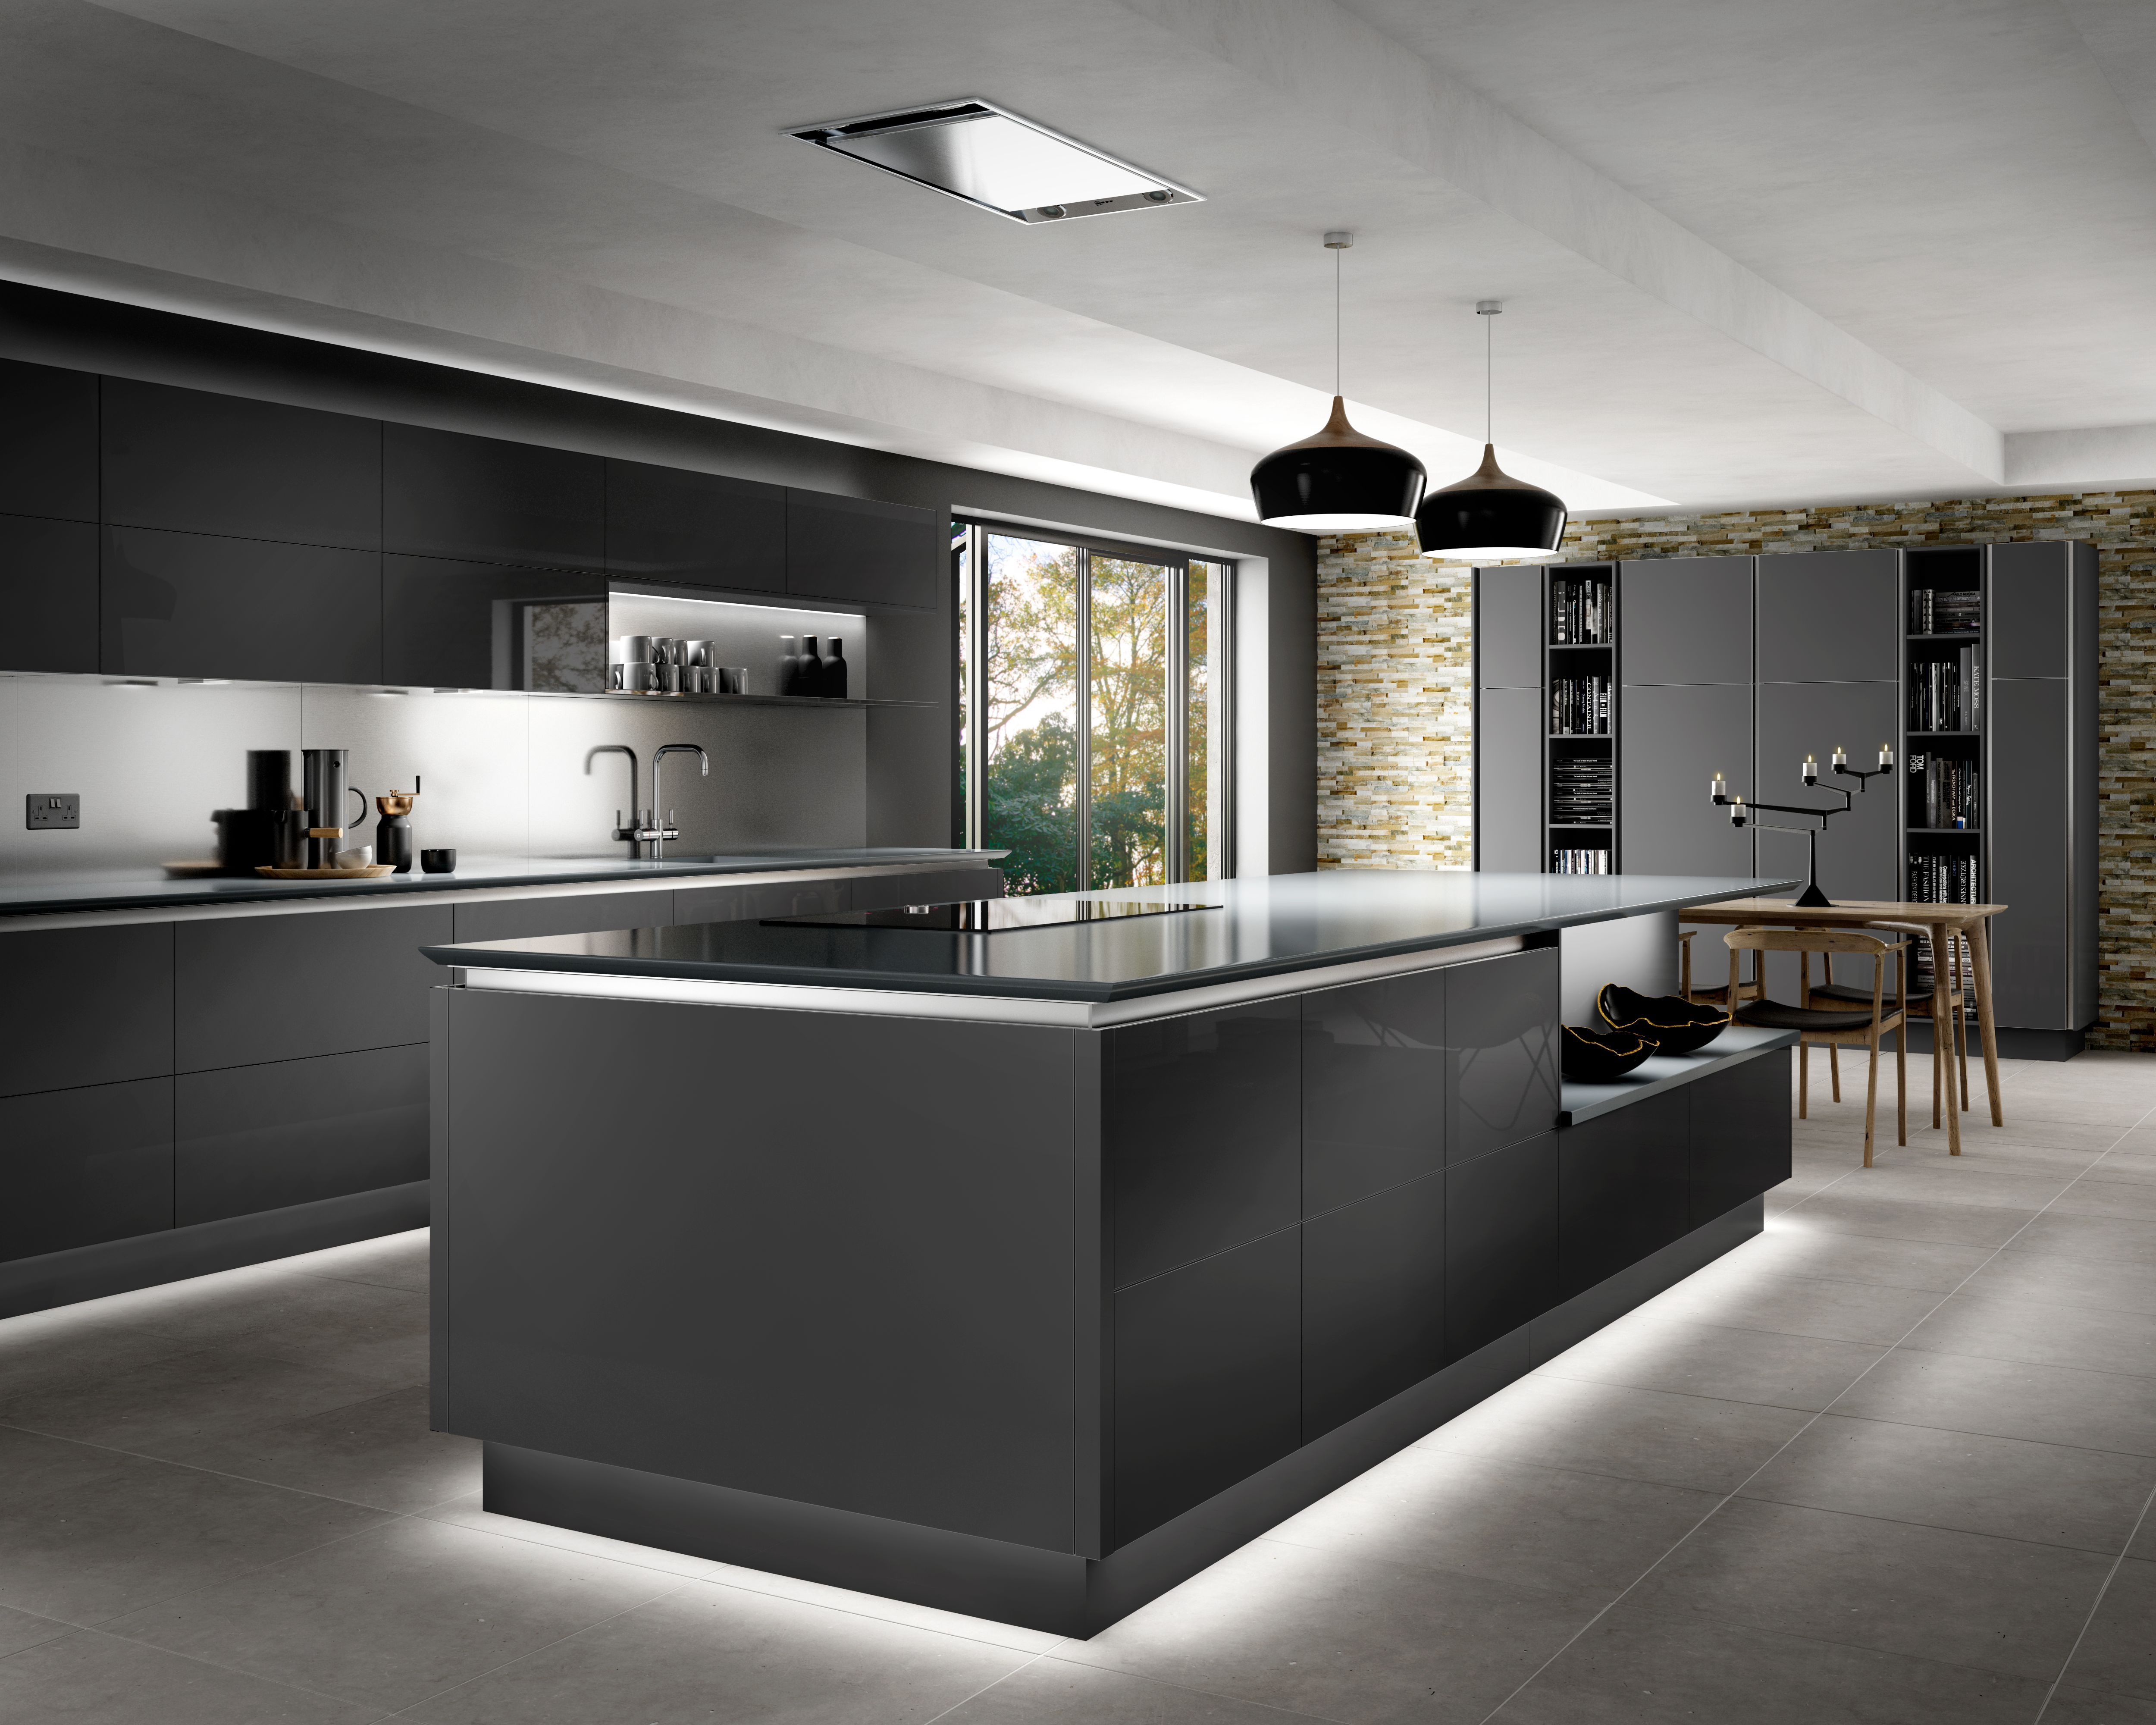 intelliga esker contemporary kitchen range wickes co uk latest kitchen designs on c kitchen design id=95193